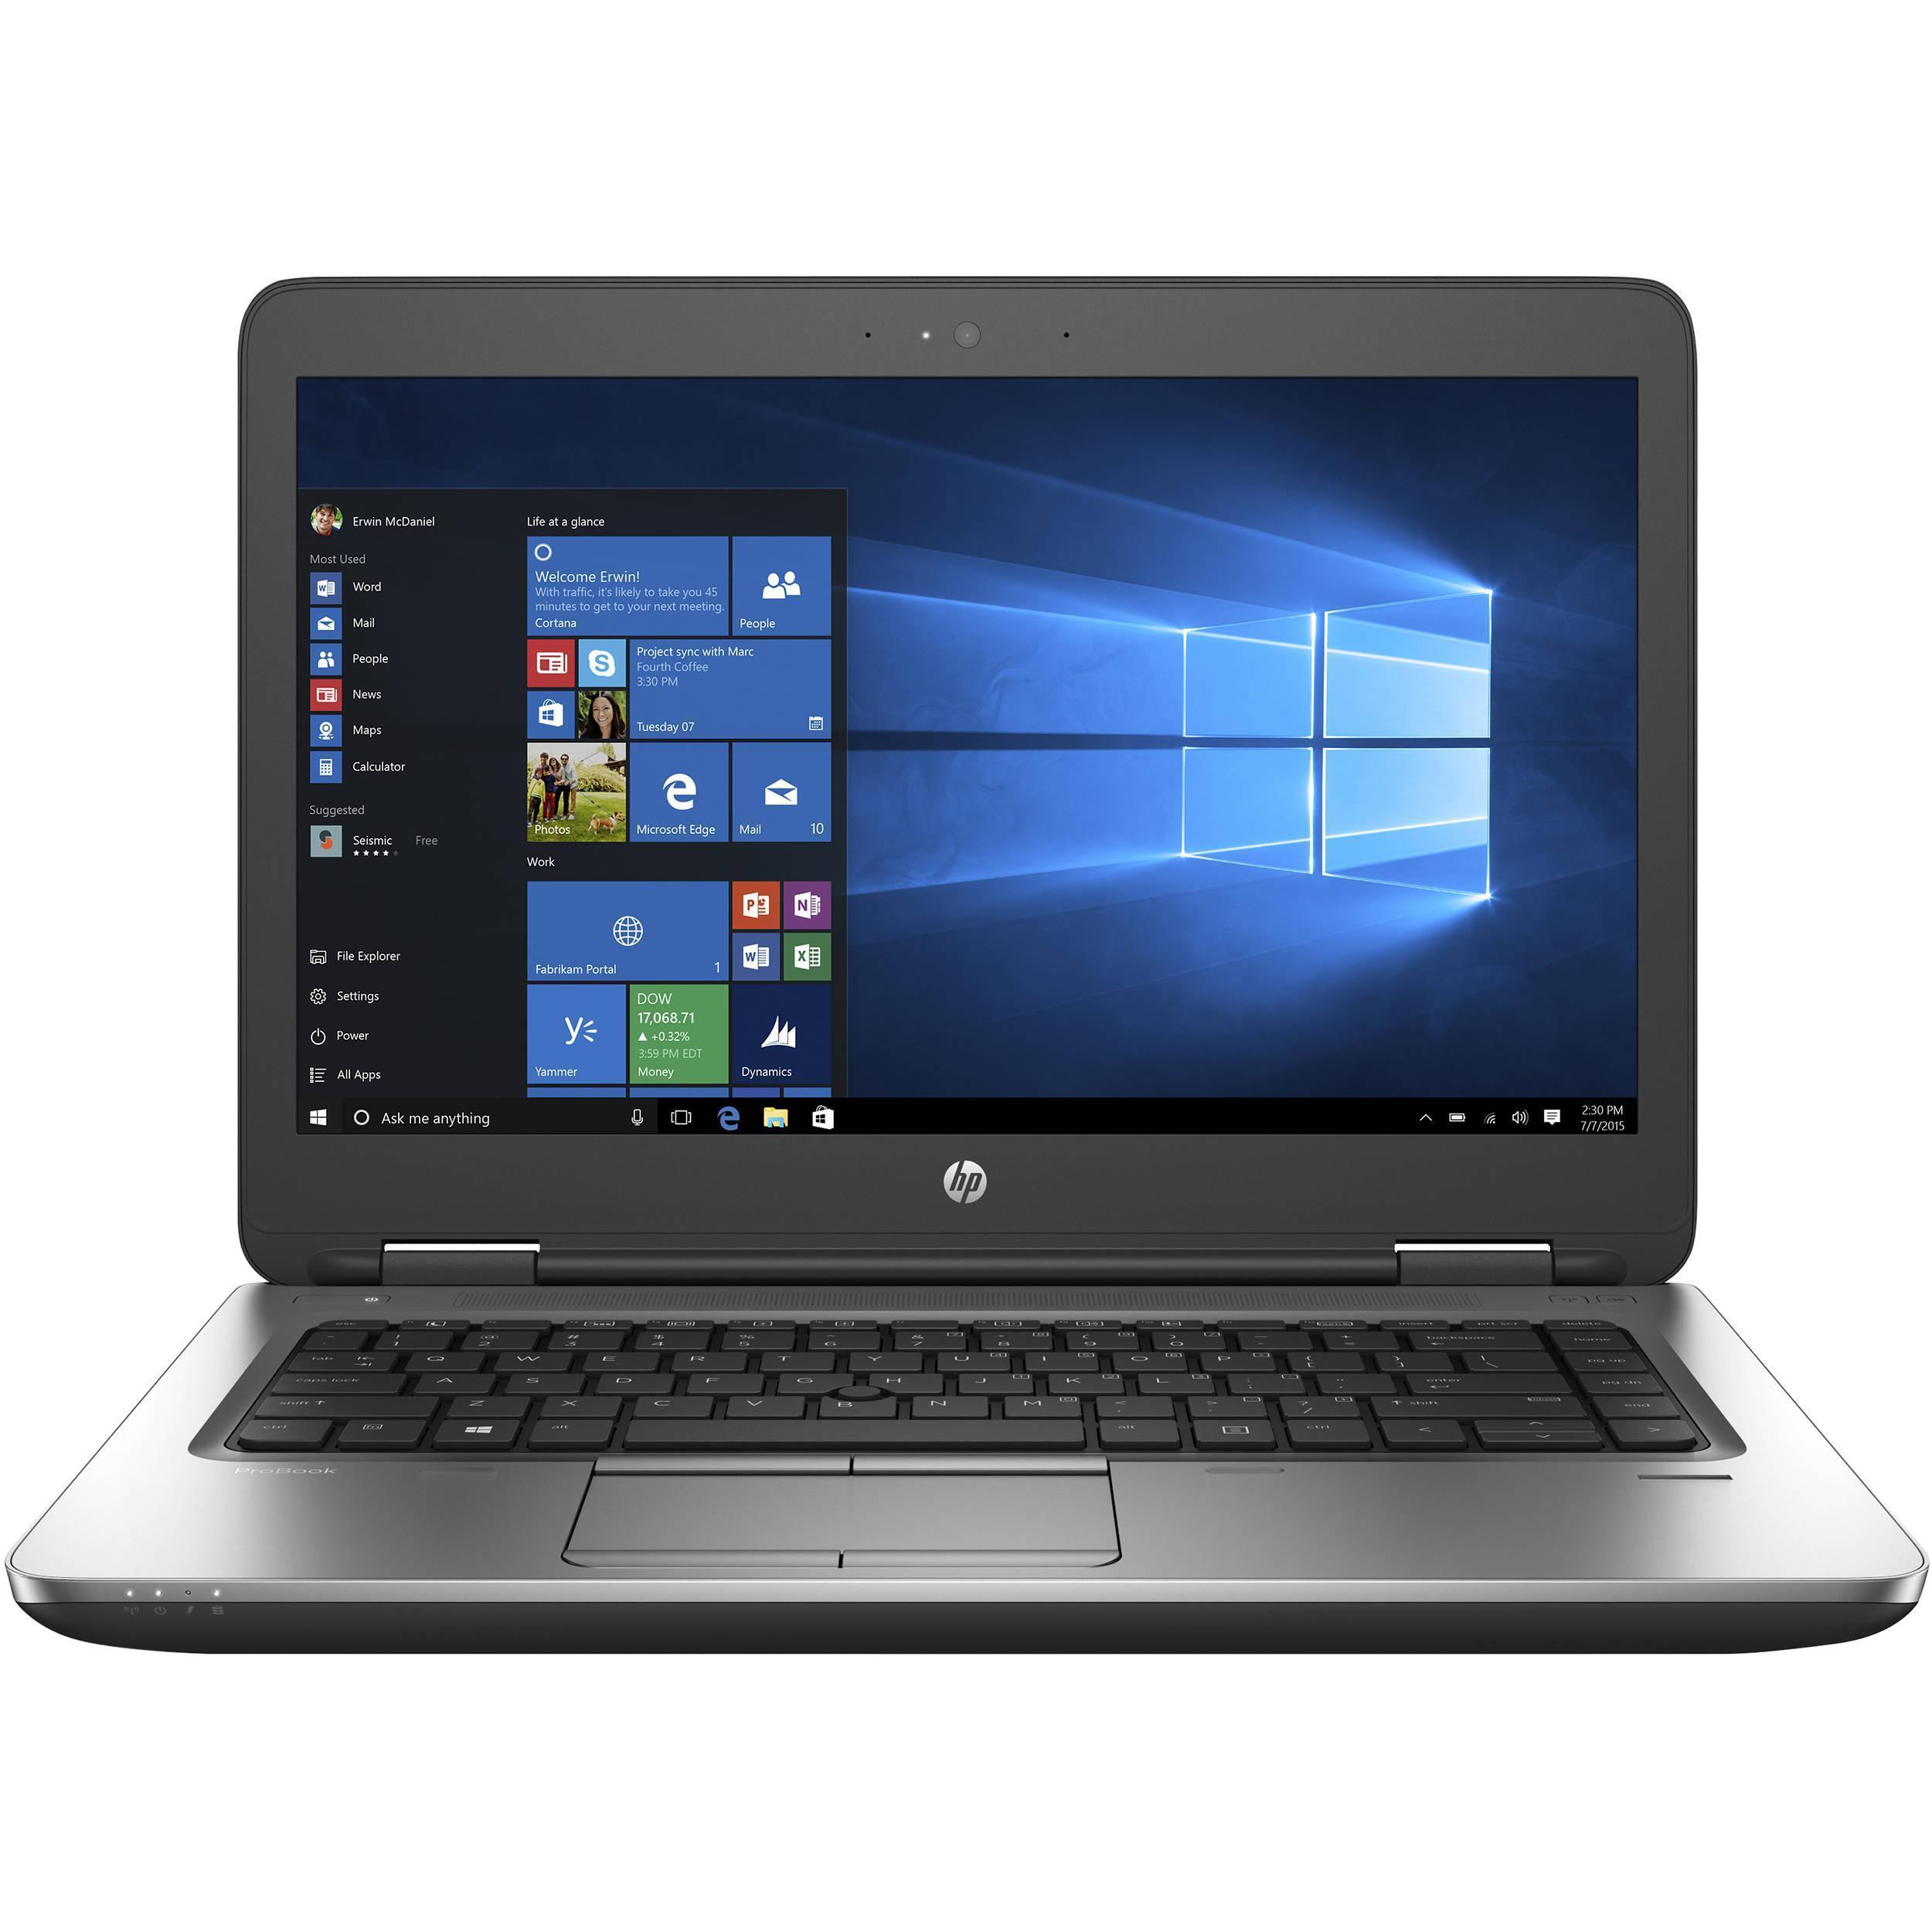 Hp ProBook 650 G2 15.6-inch (2016) - Core i5-6300U - 8 GB  - SSD 256 GB